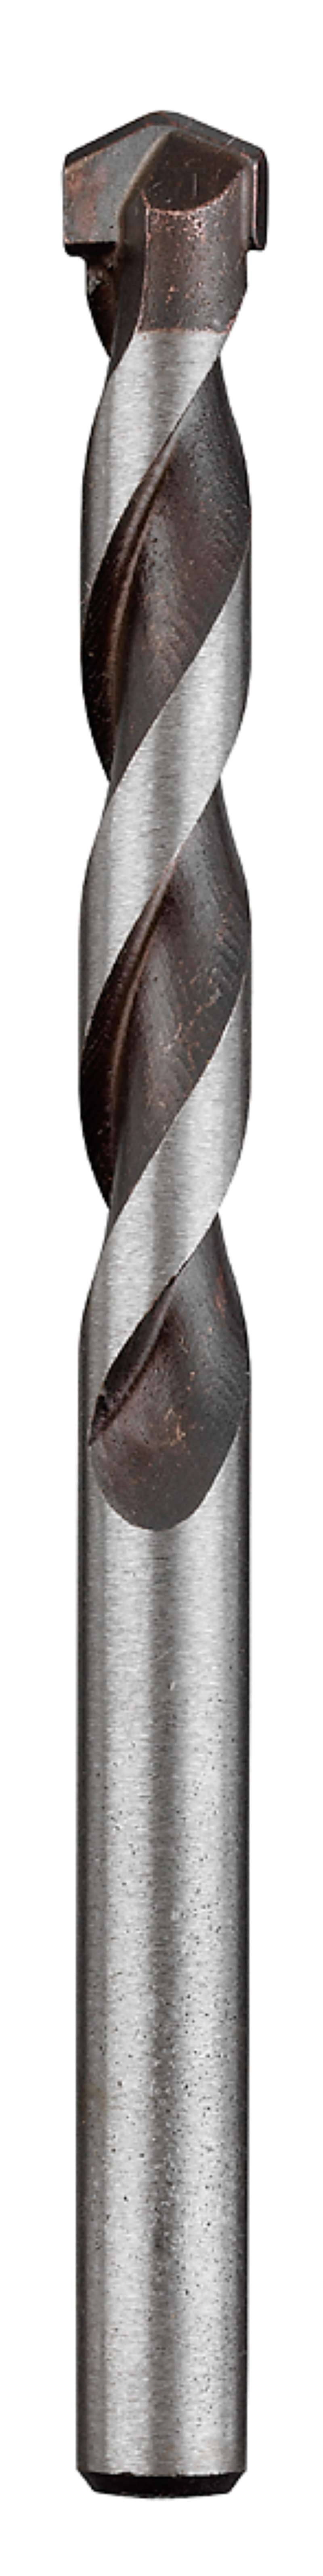 Сверло по камню Kwb 044-680 сверло по камню kwb 044 700